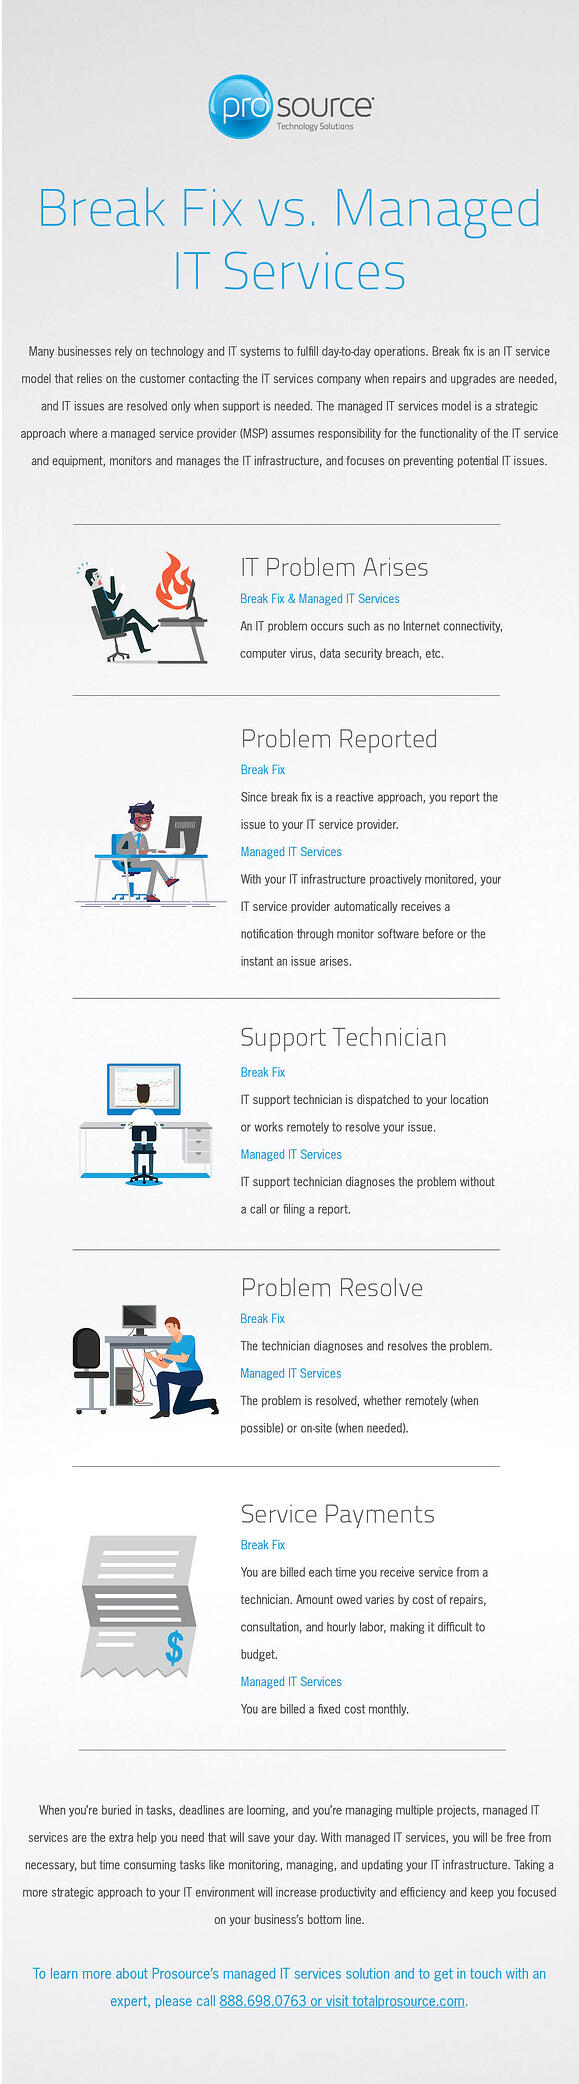 MITS vs. Break Fix Infographic_Web-1.jpg